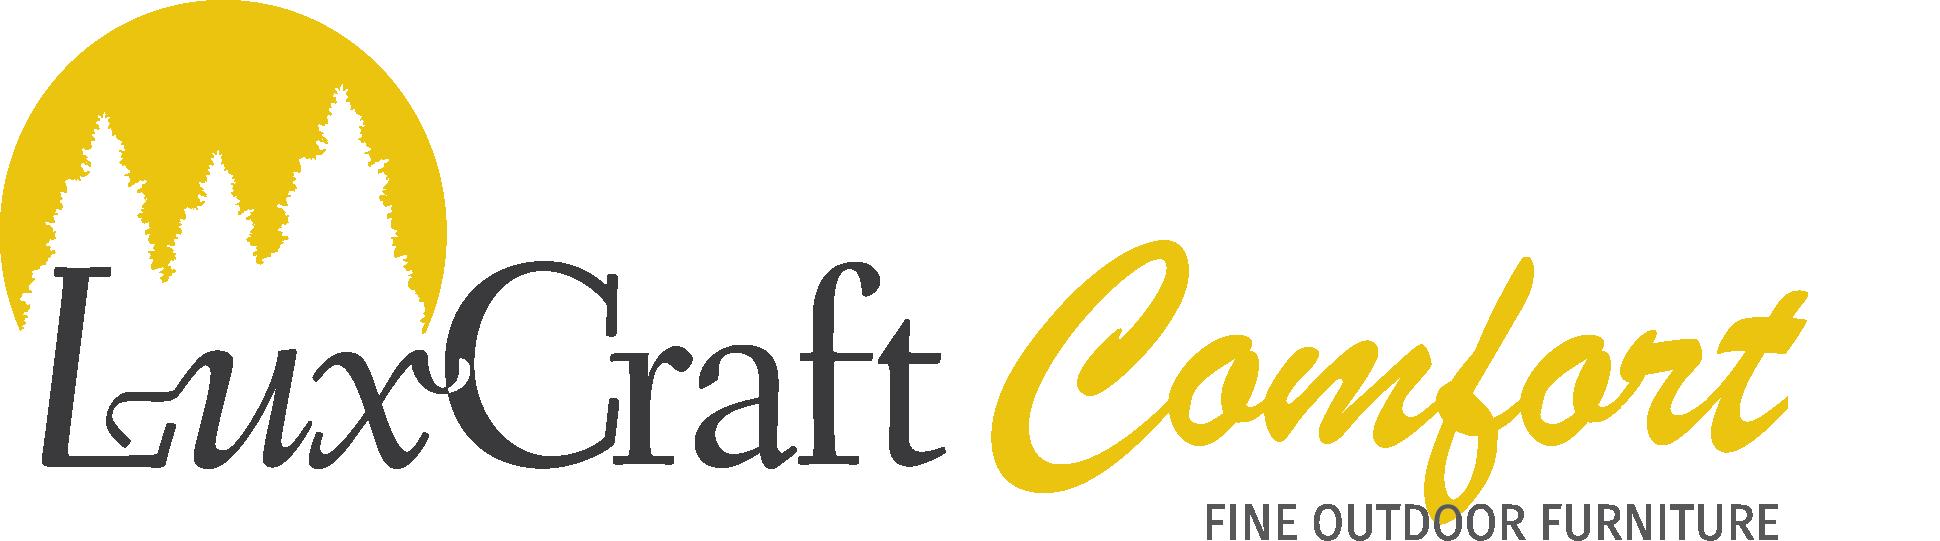 LuxCraft Comfort